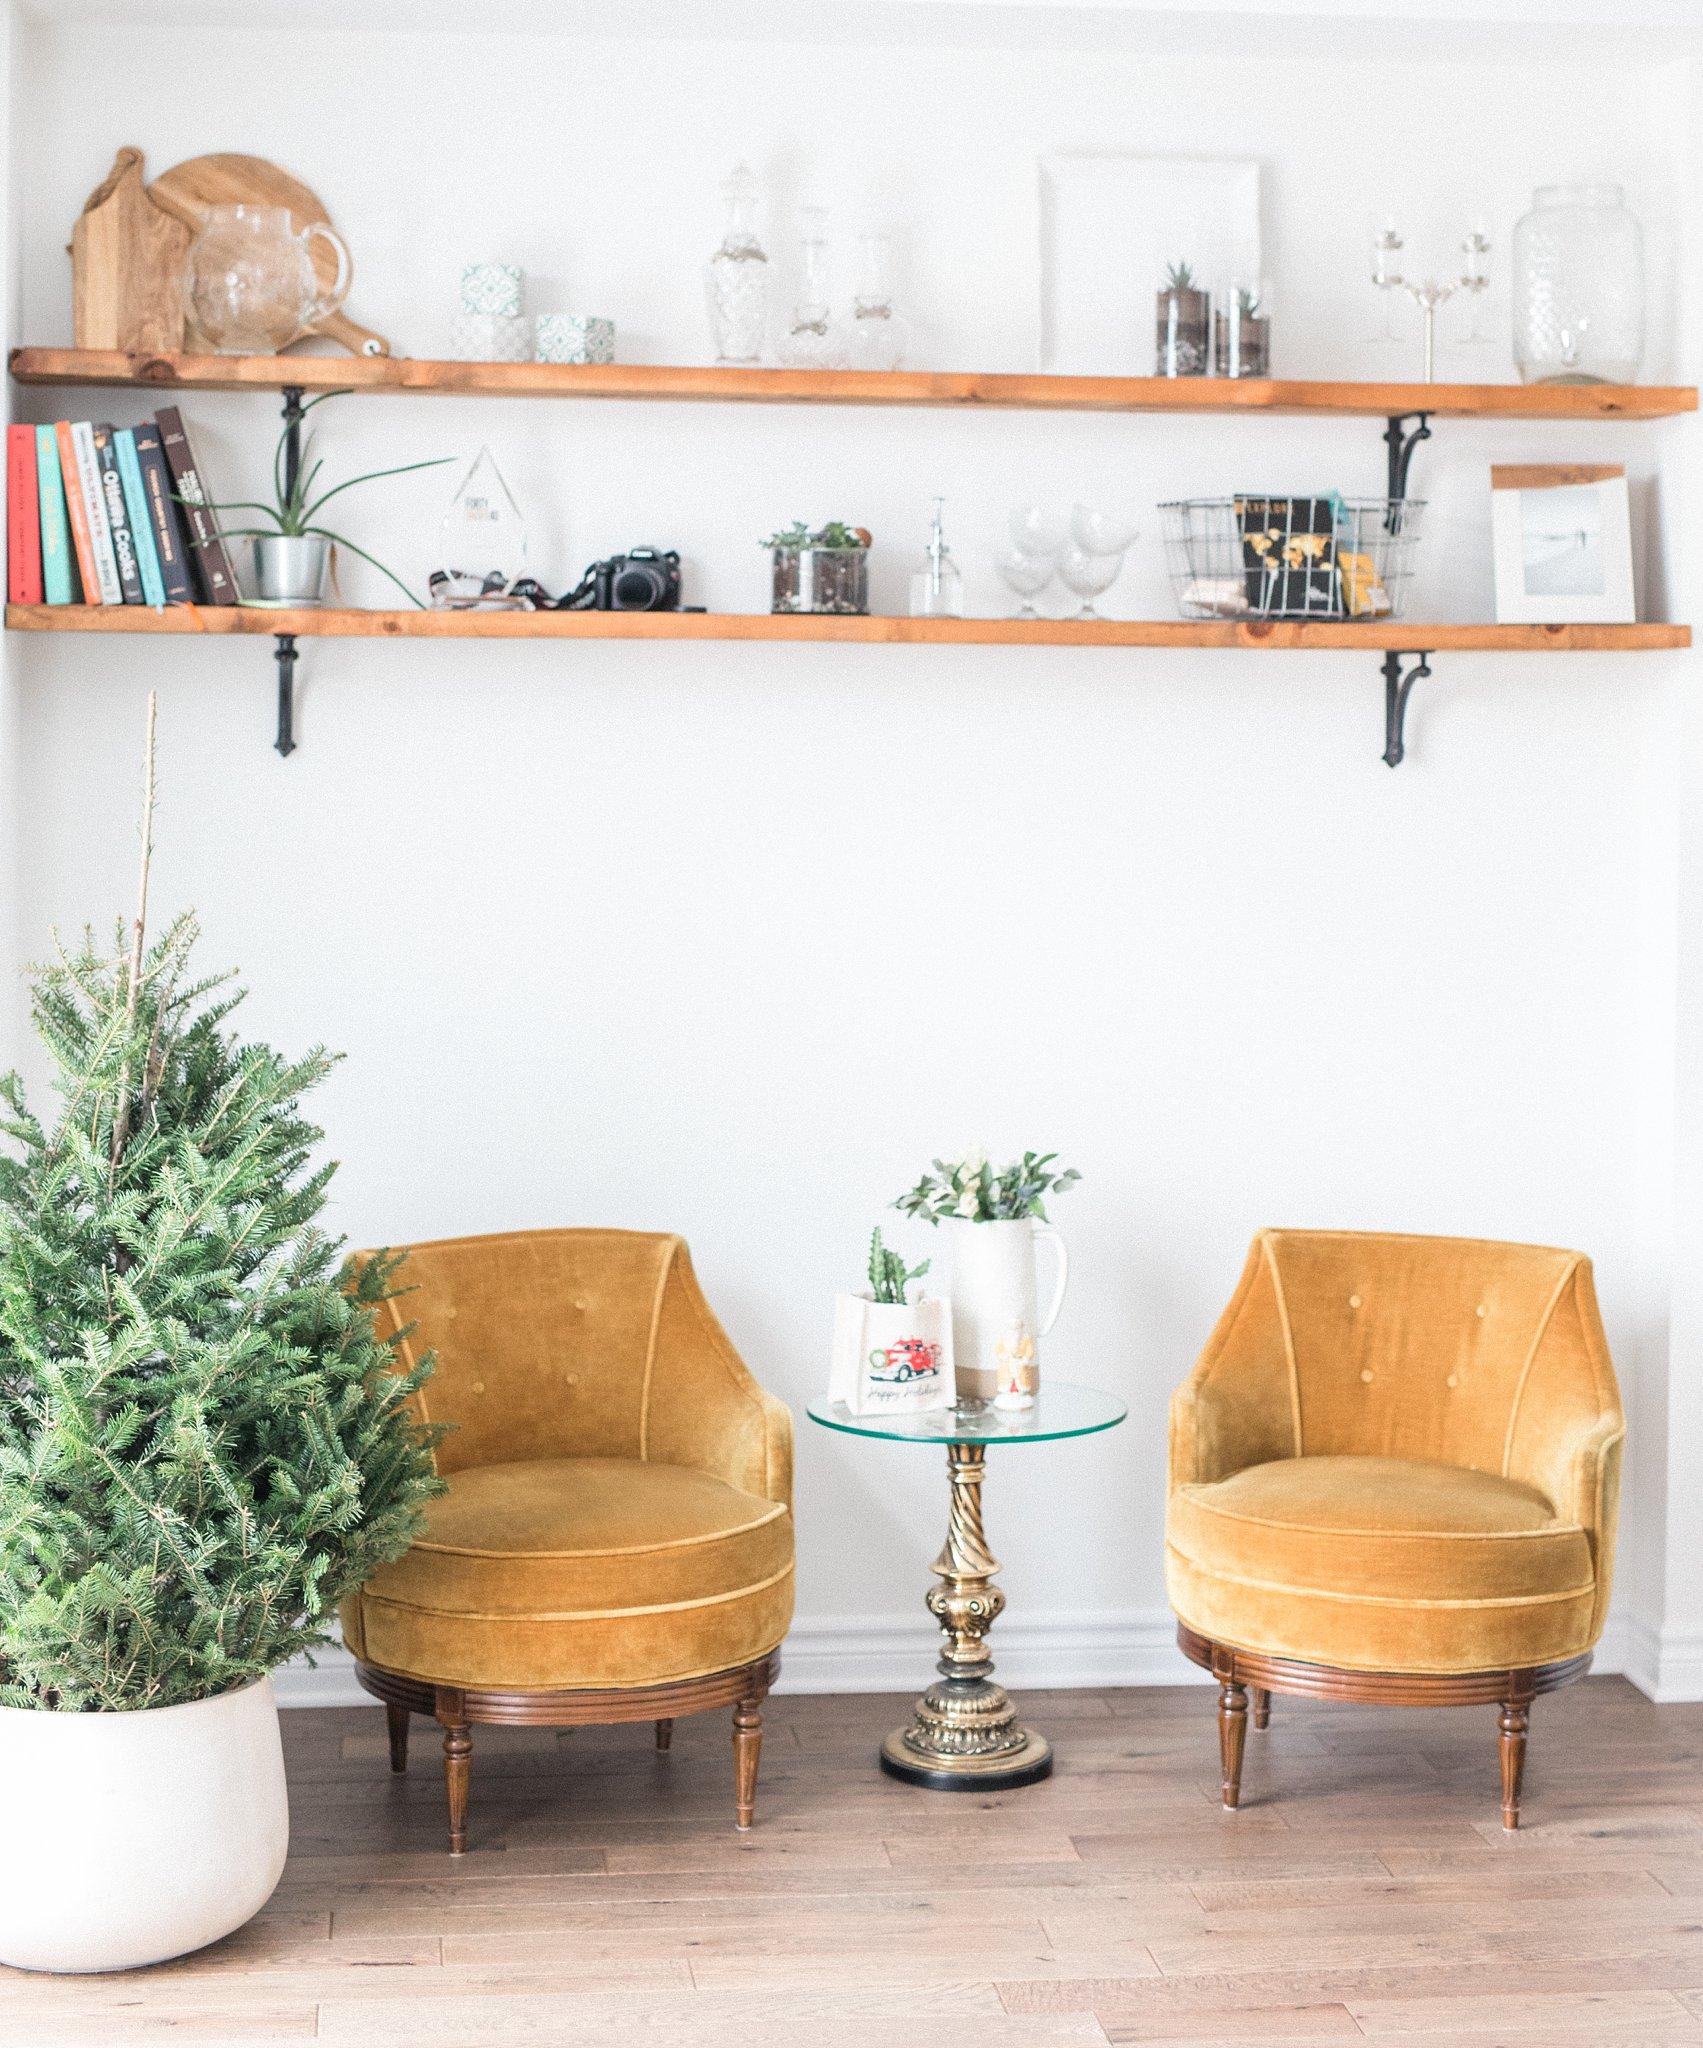 Vintage yellow velvet chairs, Festive Newborn Lifestyle Photos During the Christmas Holidays